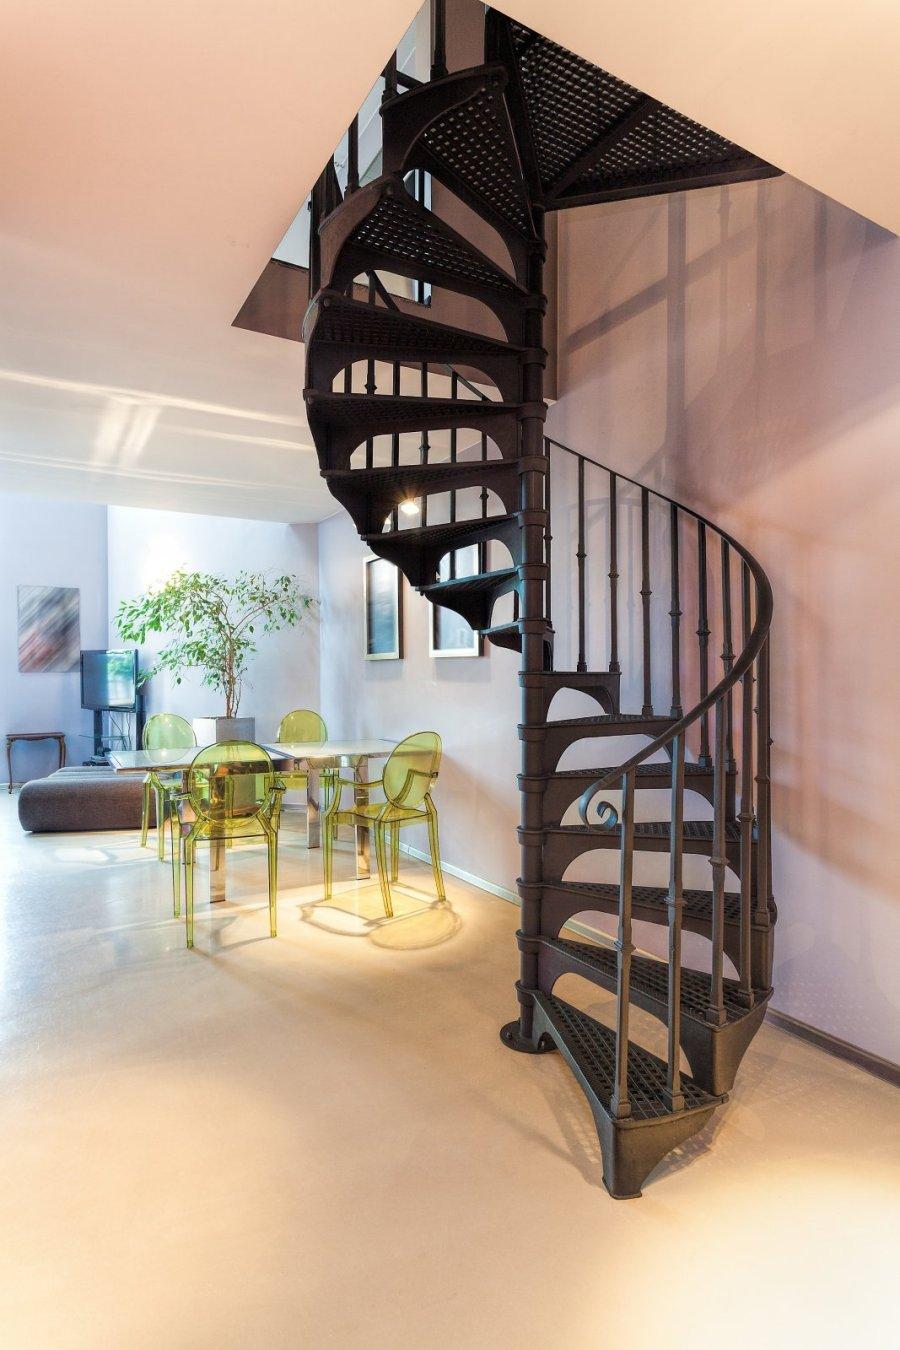 4 naudingi patarimai sirengiant laiptus - Changer escalier de place ...